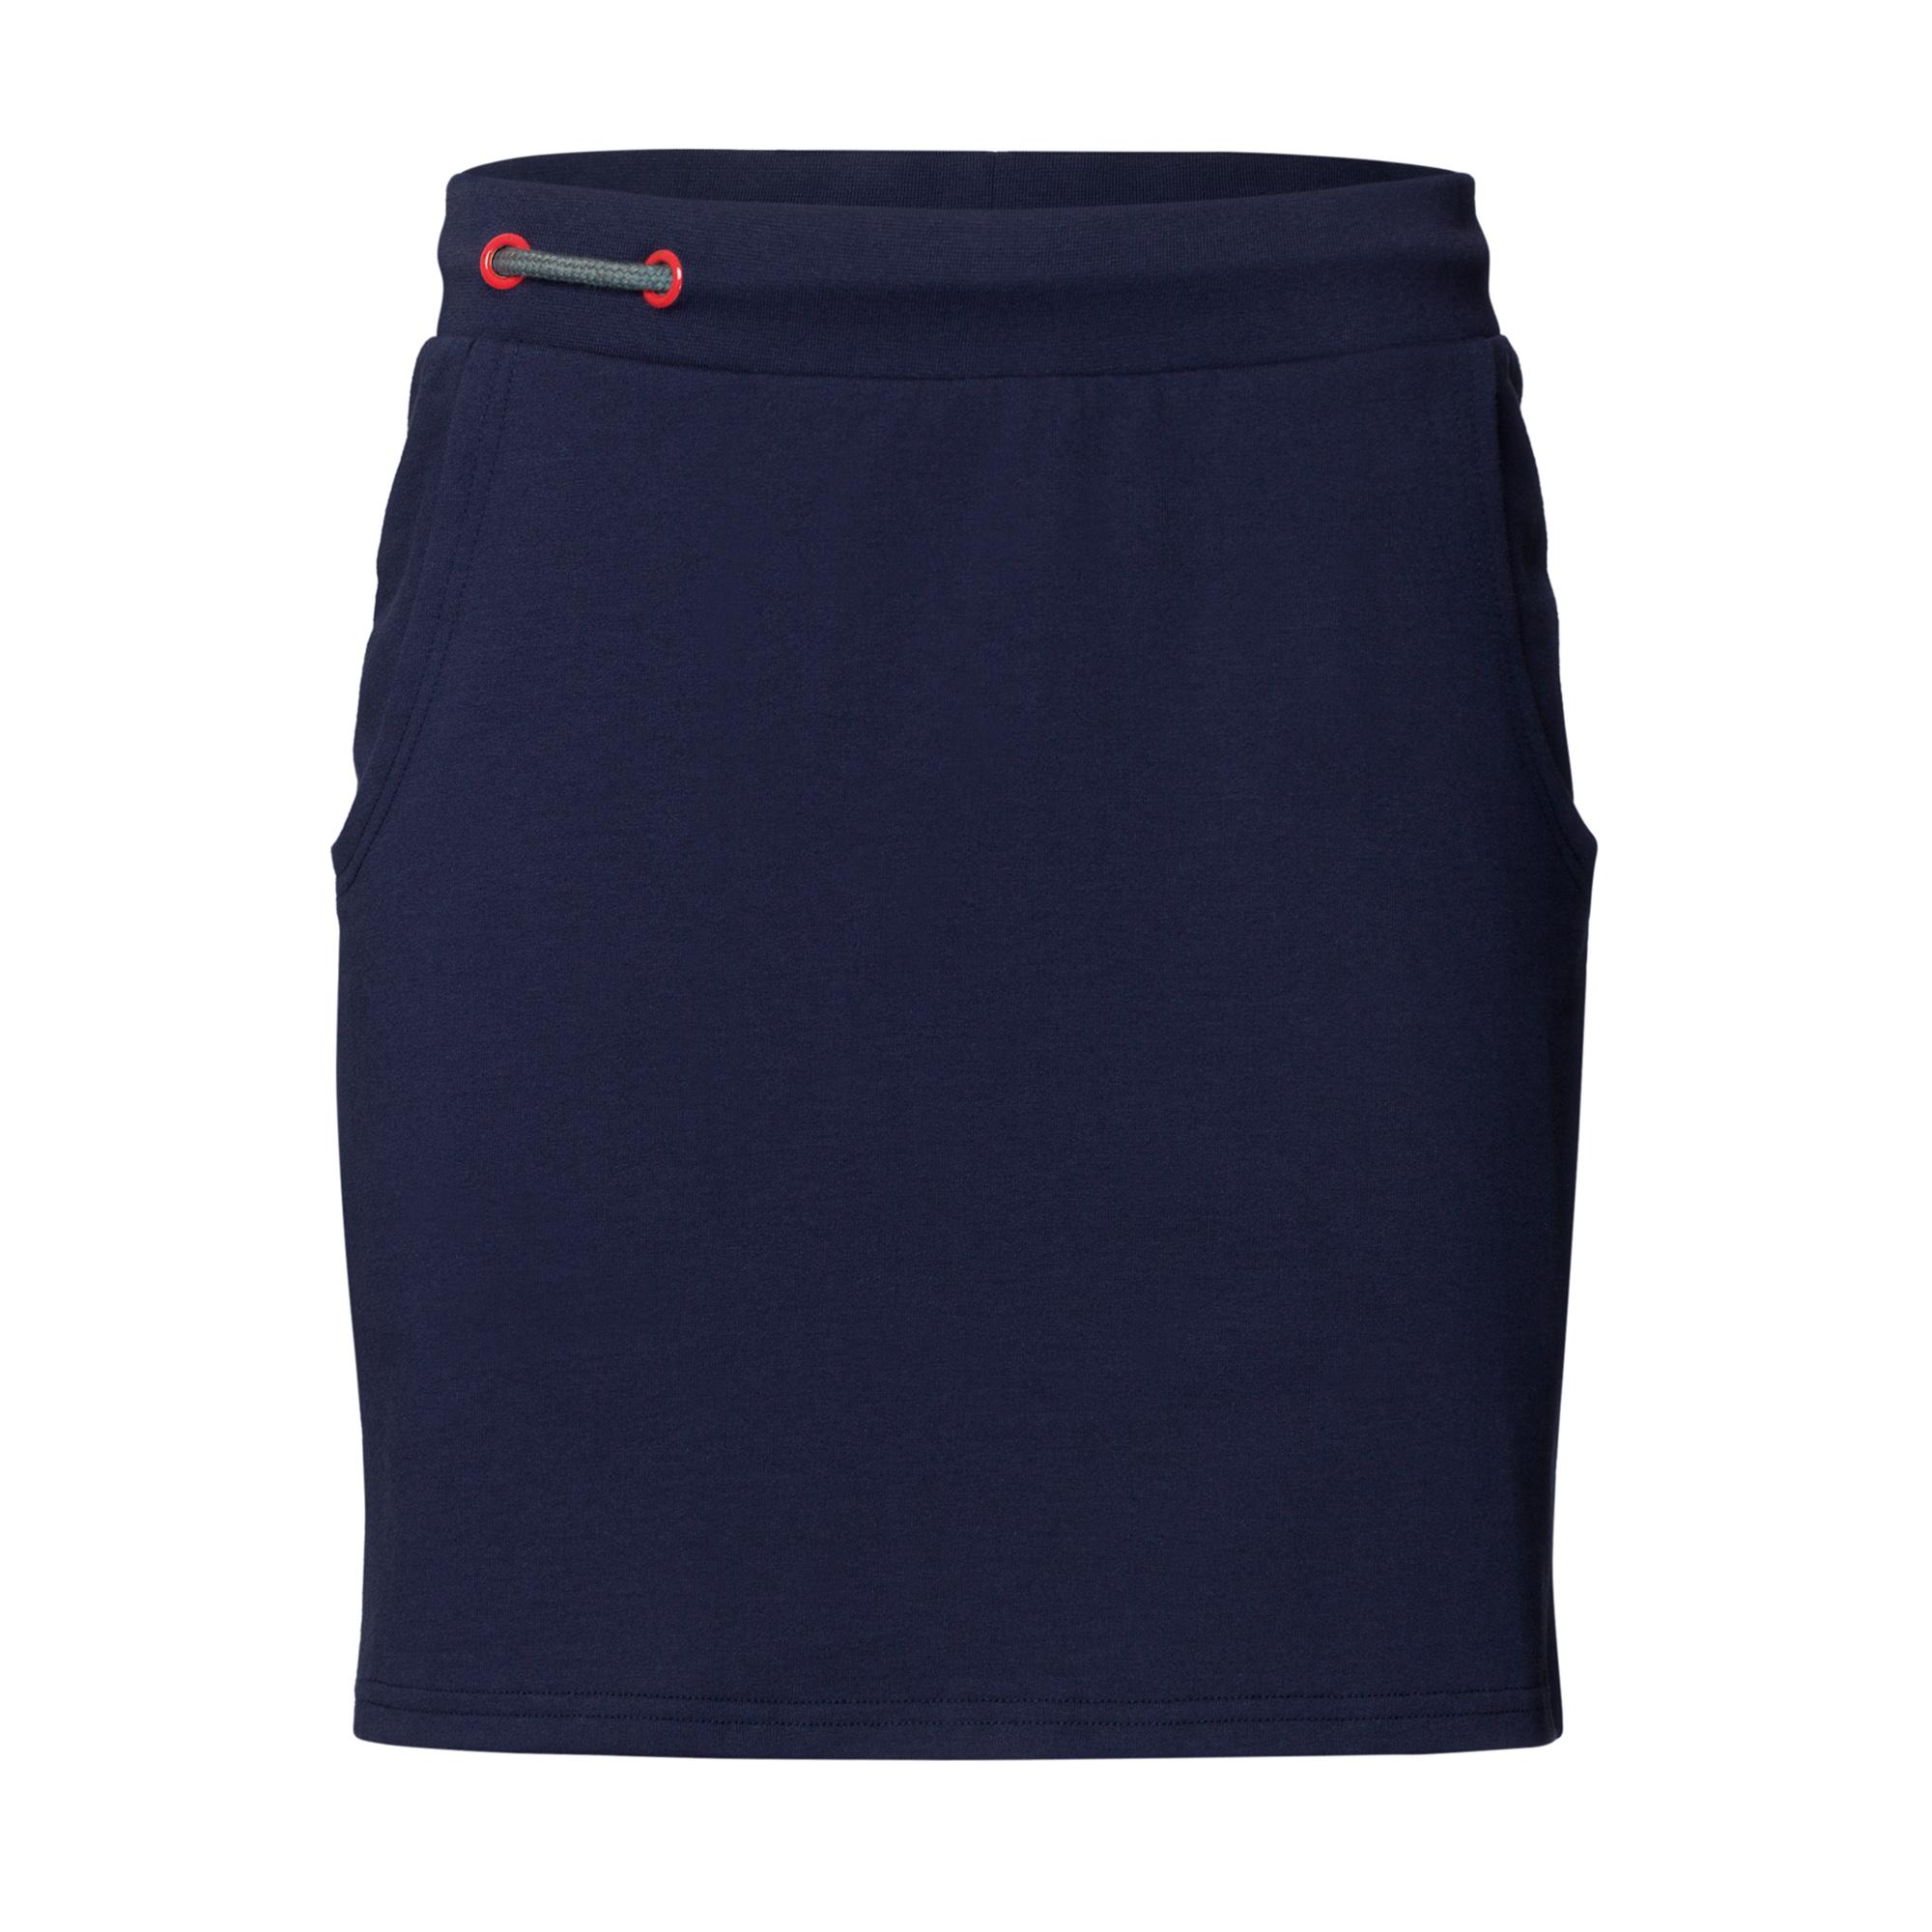 TT1033 Mini Skirt Midnight GOTS & Fairtrade